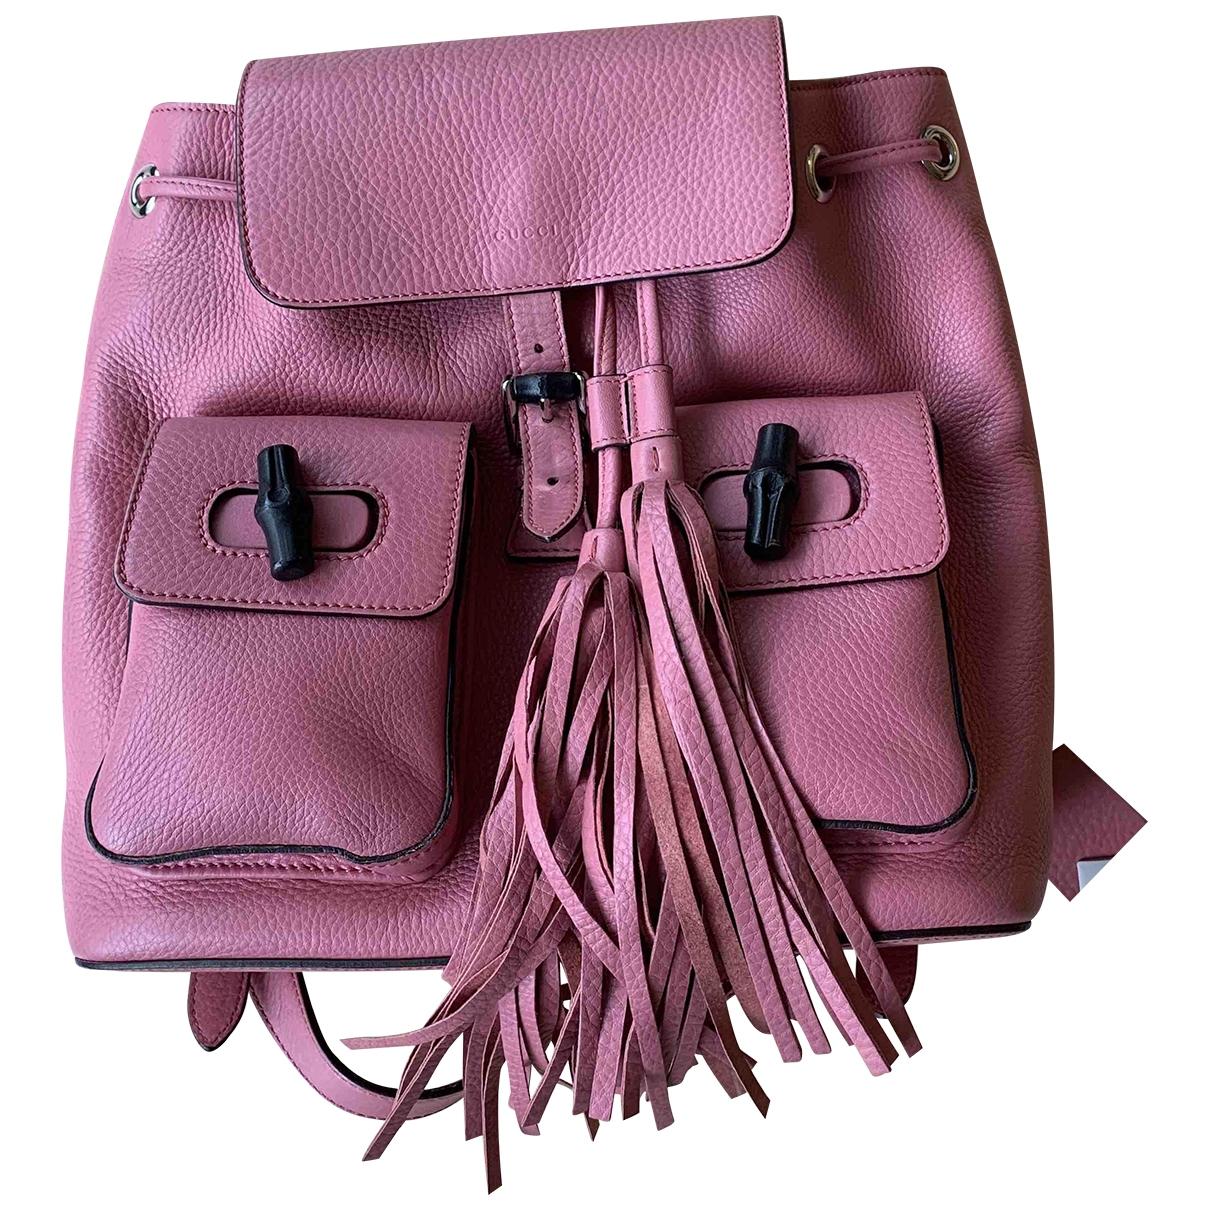 Gucci - Sac a dos Bamboo pour femme en cuir - rose